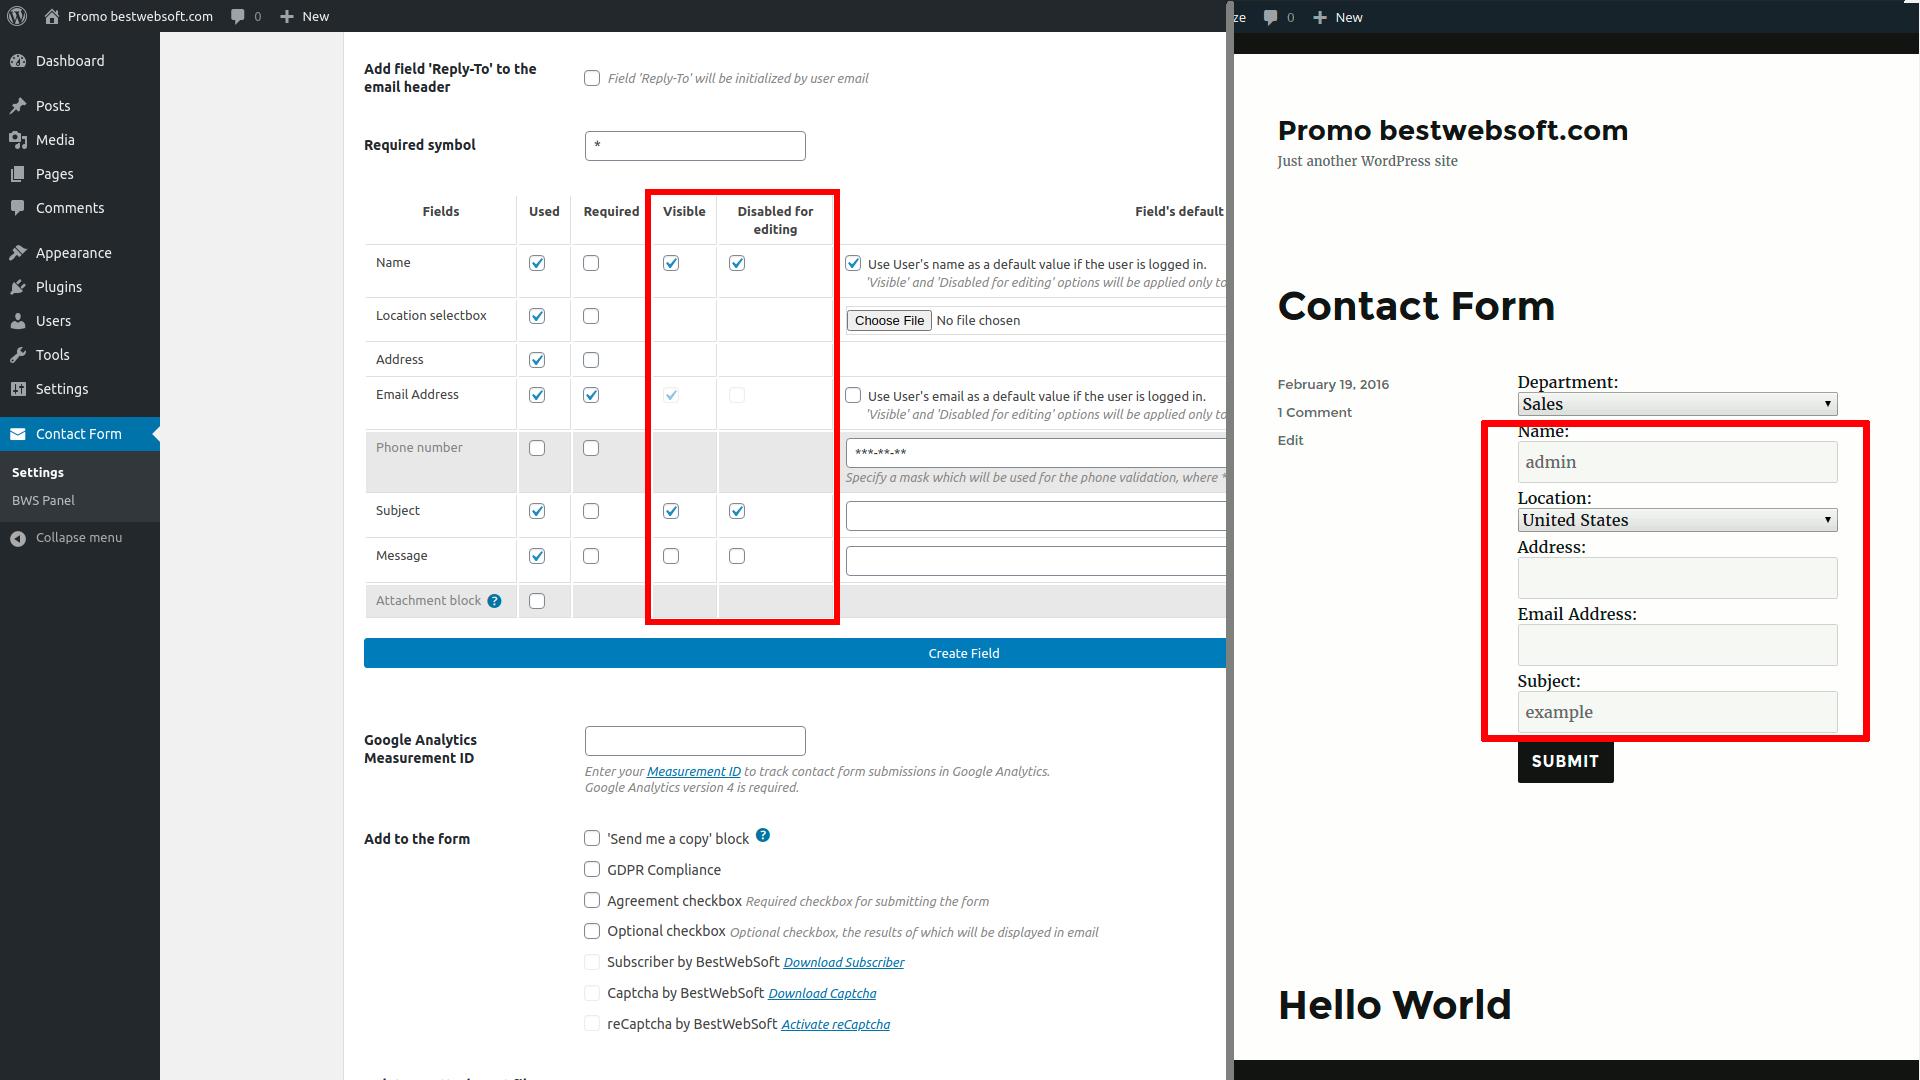 contact form screenshot 29